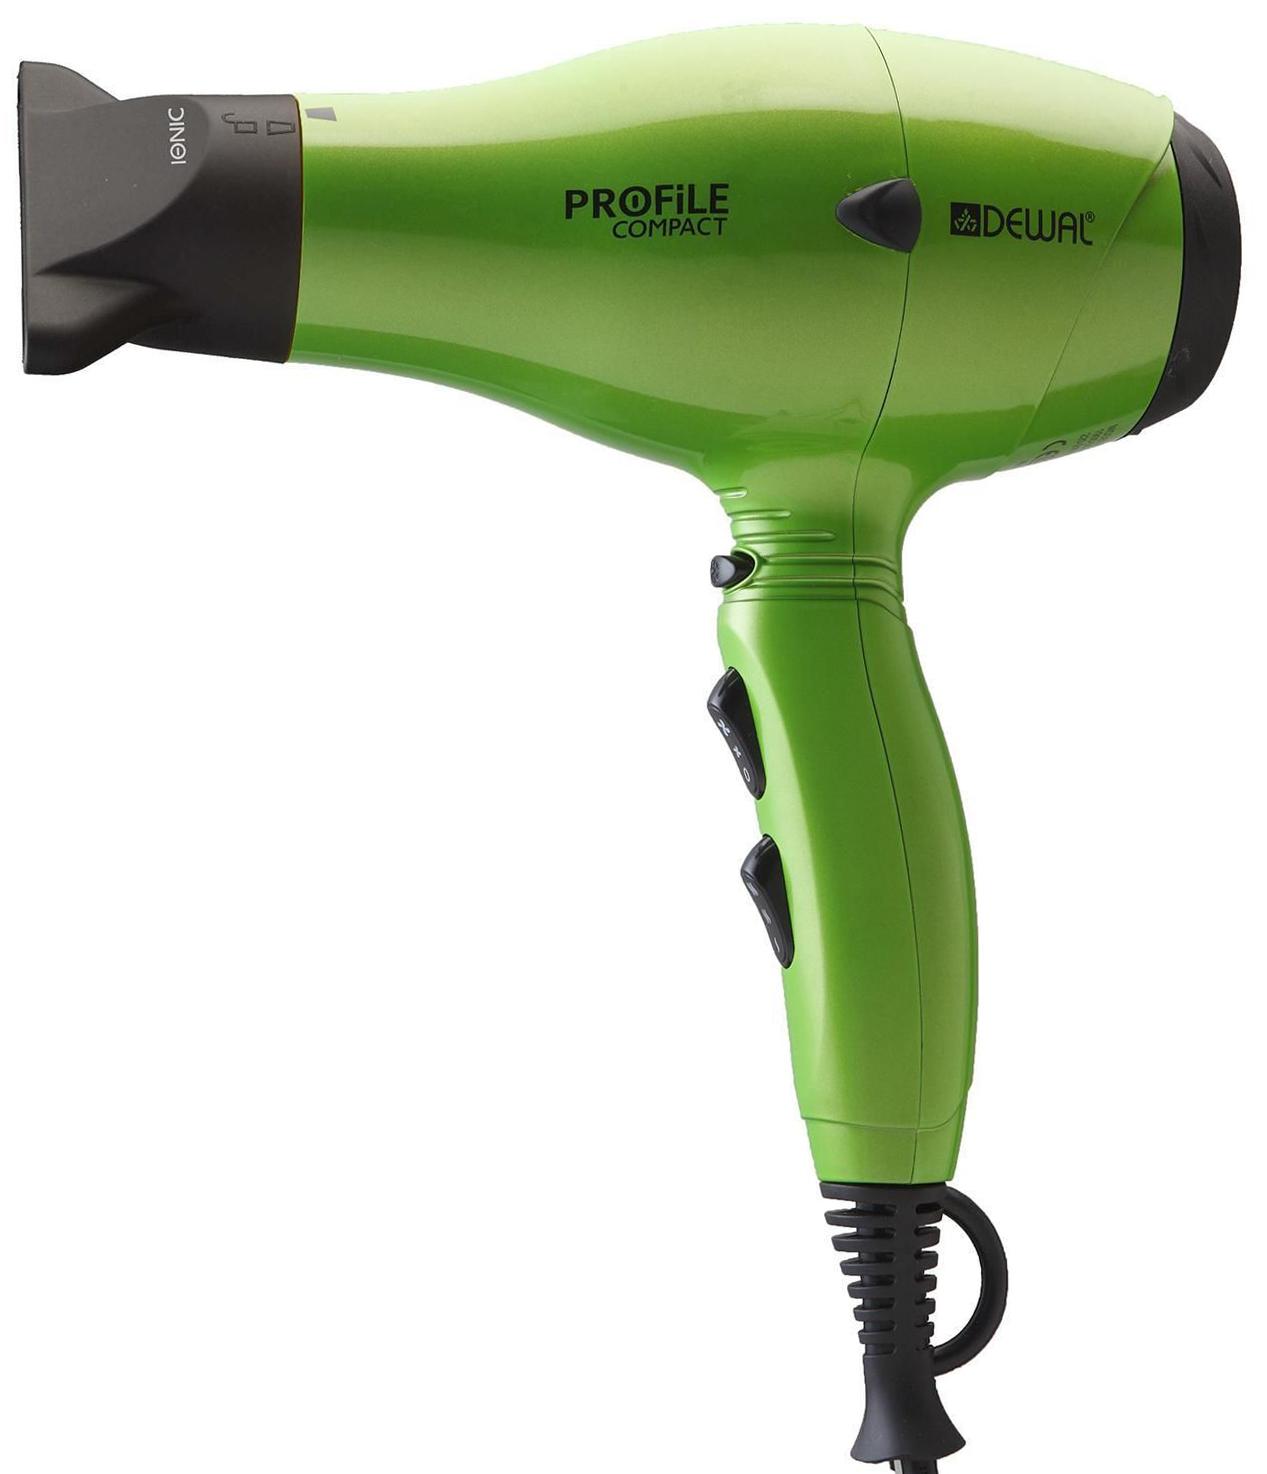 ФенDewal Profile Compact 03 119 Green